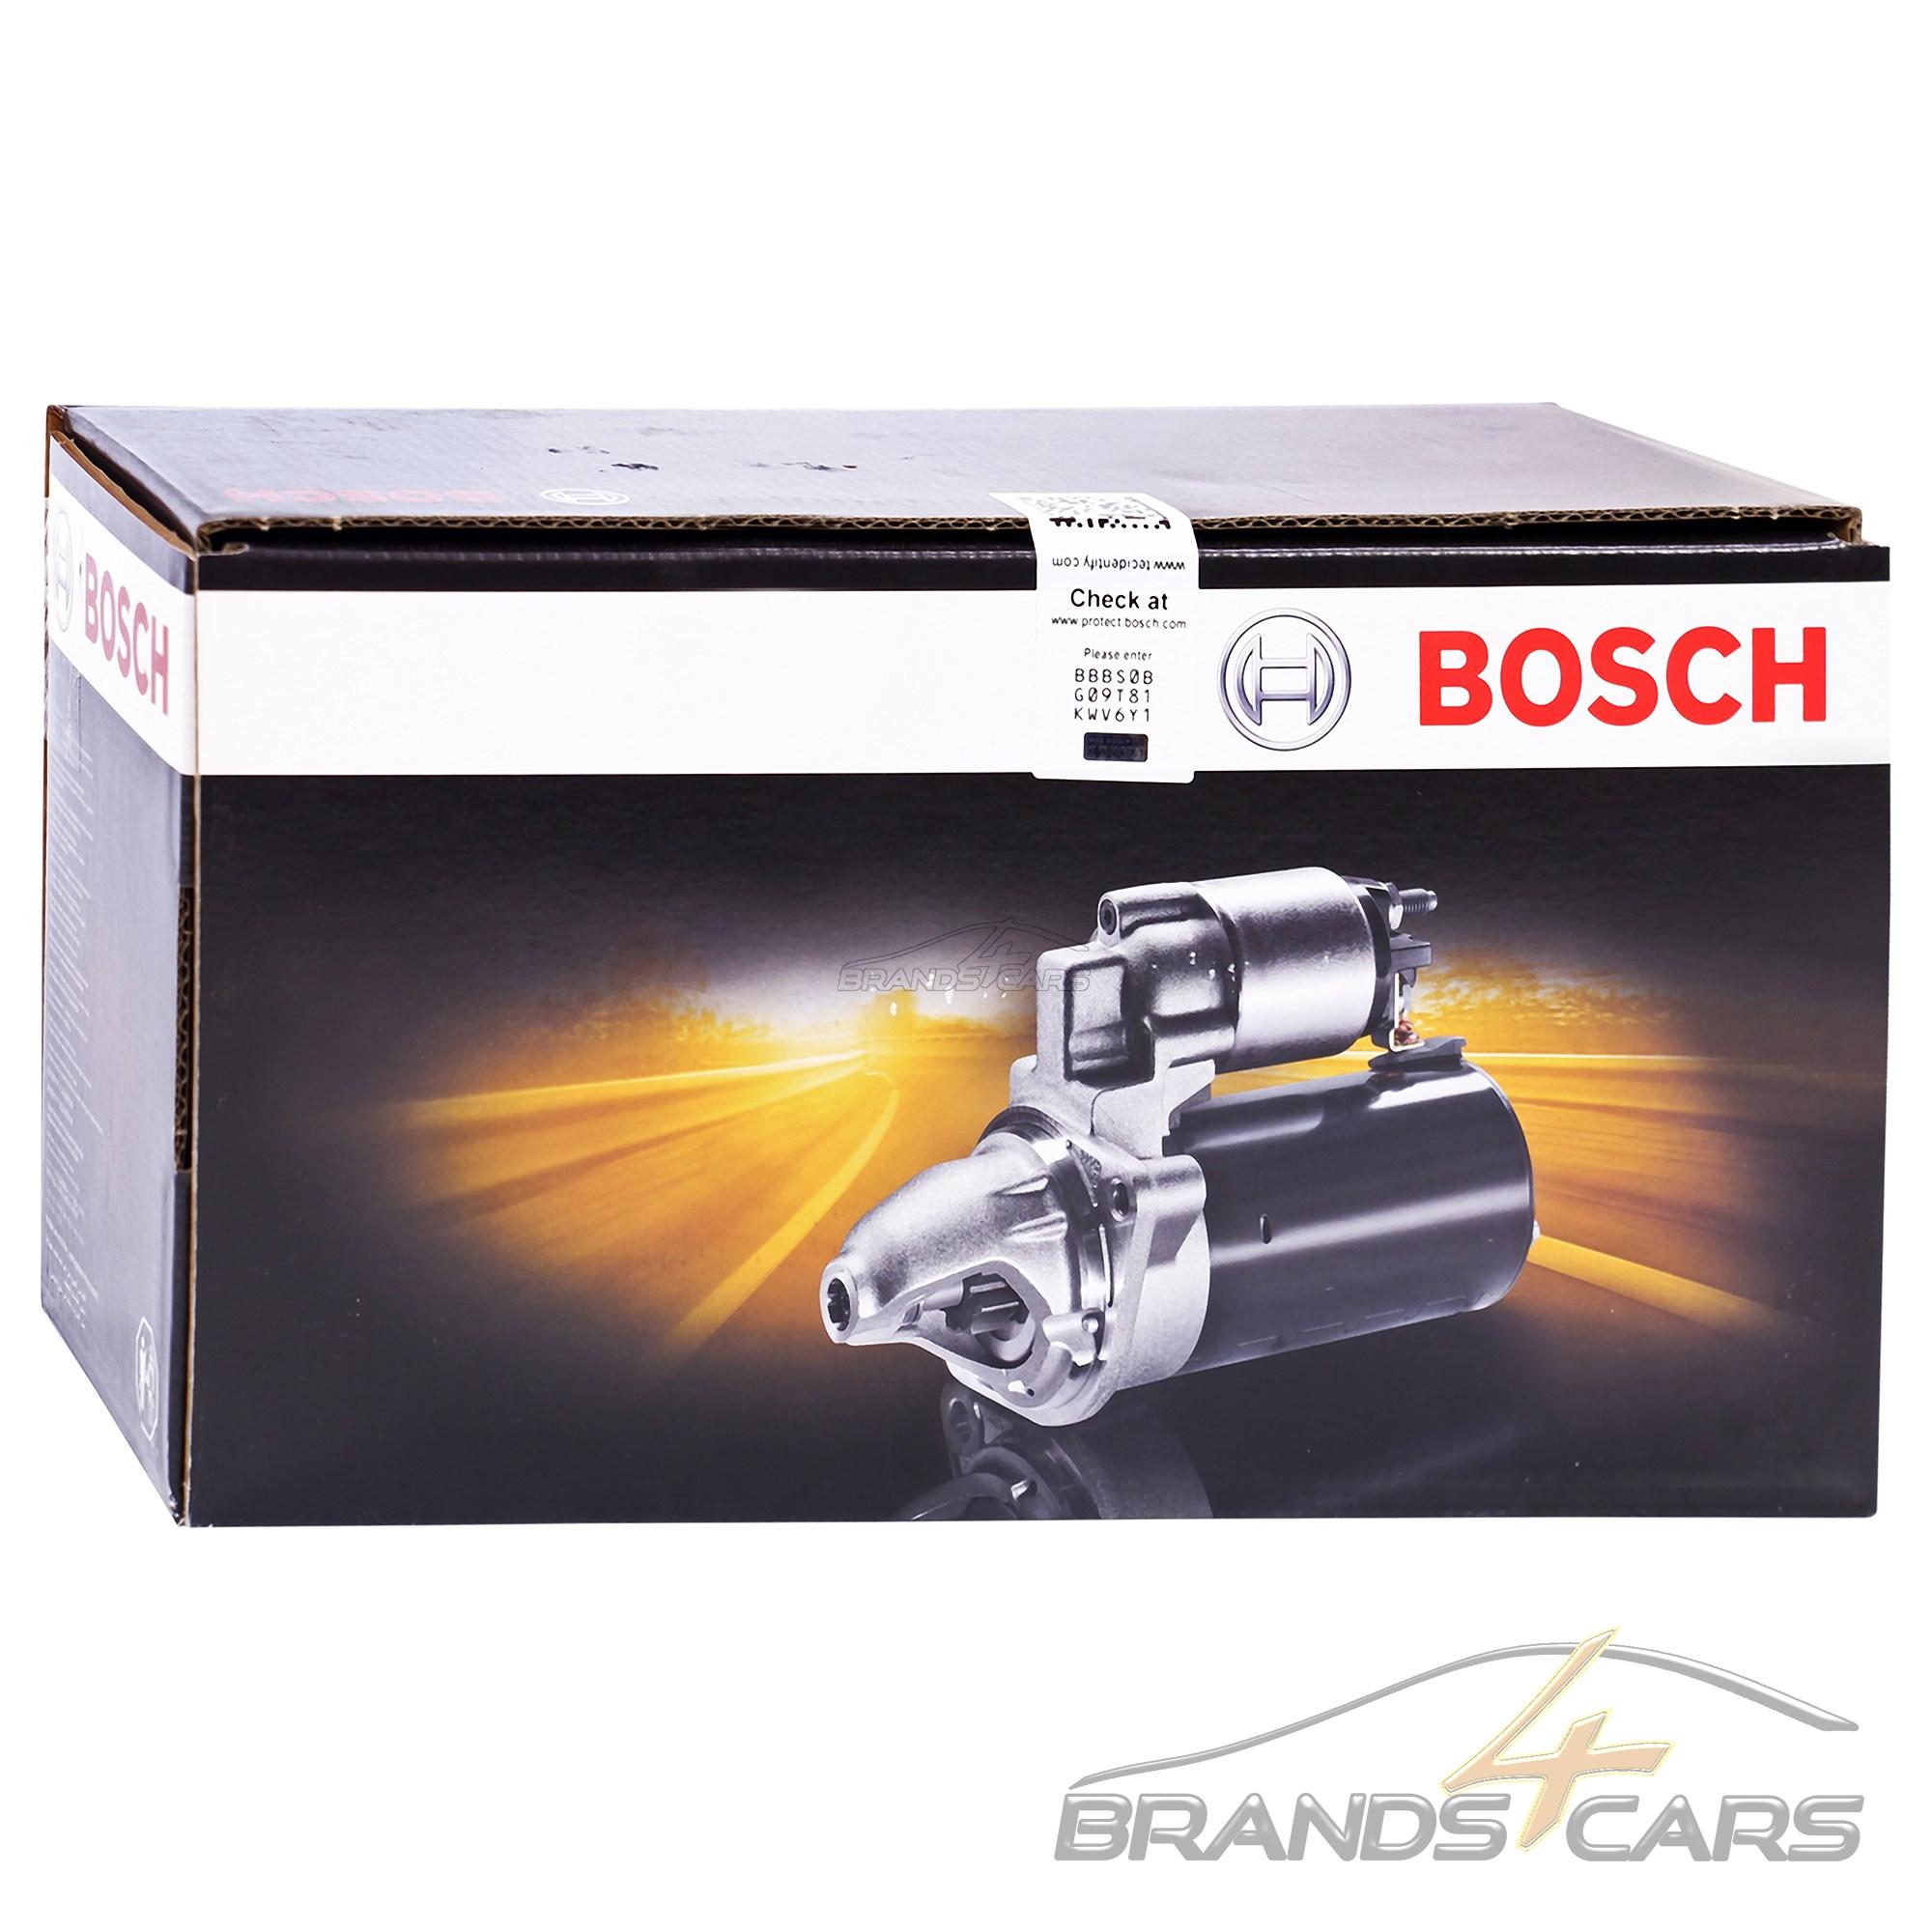 BOSCH STARTER ANLASSER 2KW AUDI A2 8Z 1.4 TDI A3 8L 1.9 TDI BJ 96-03